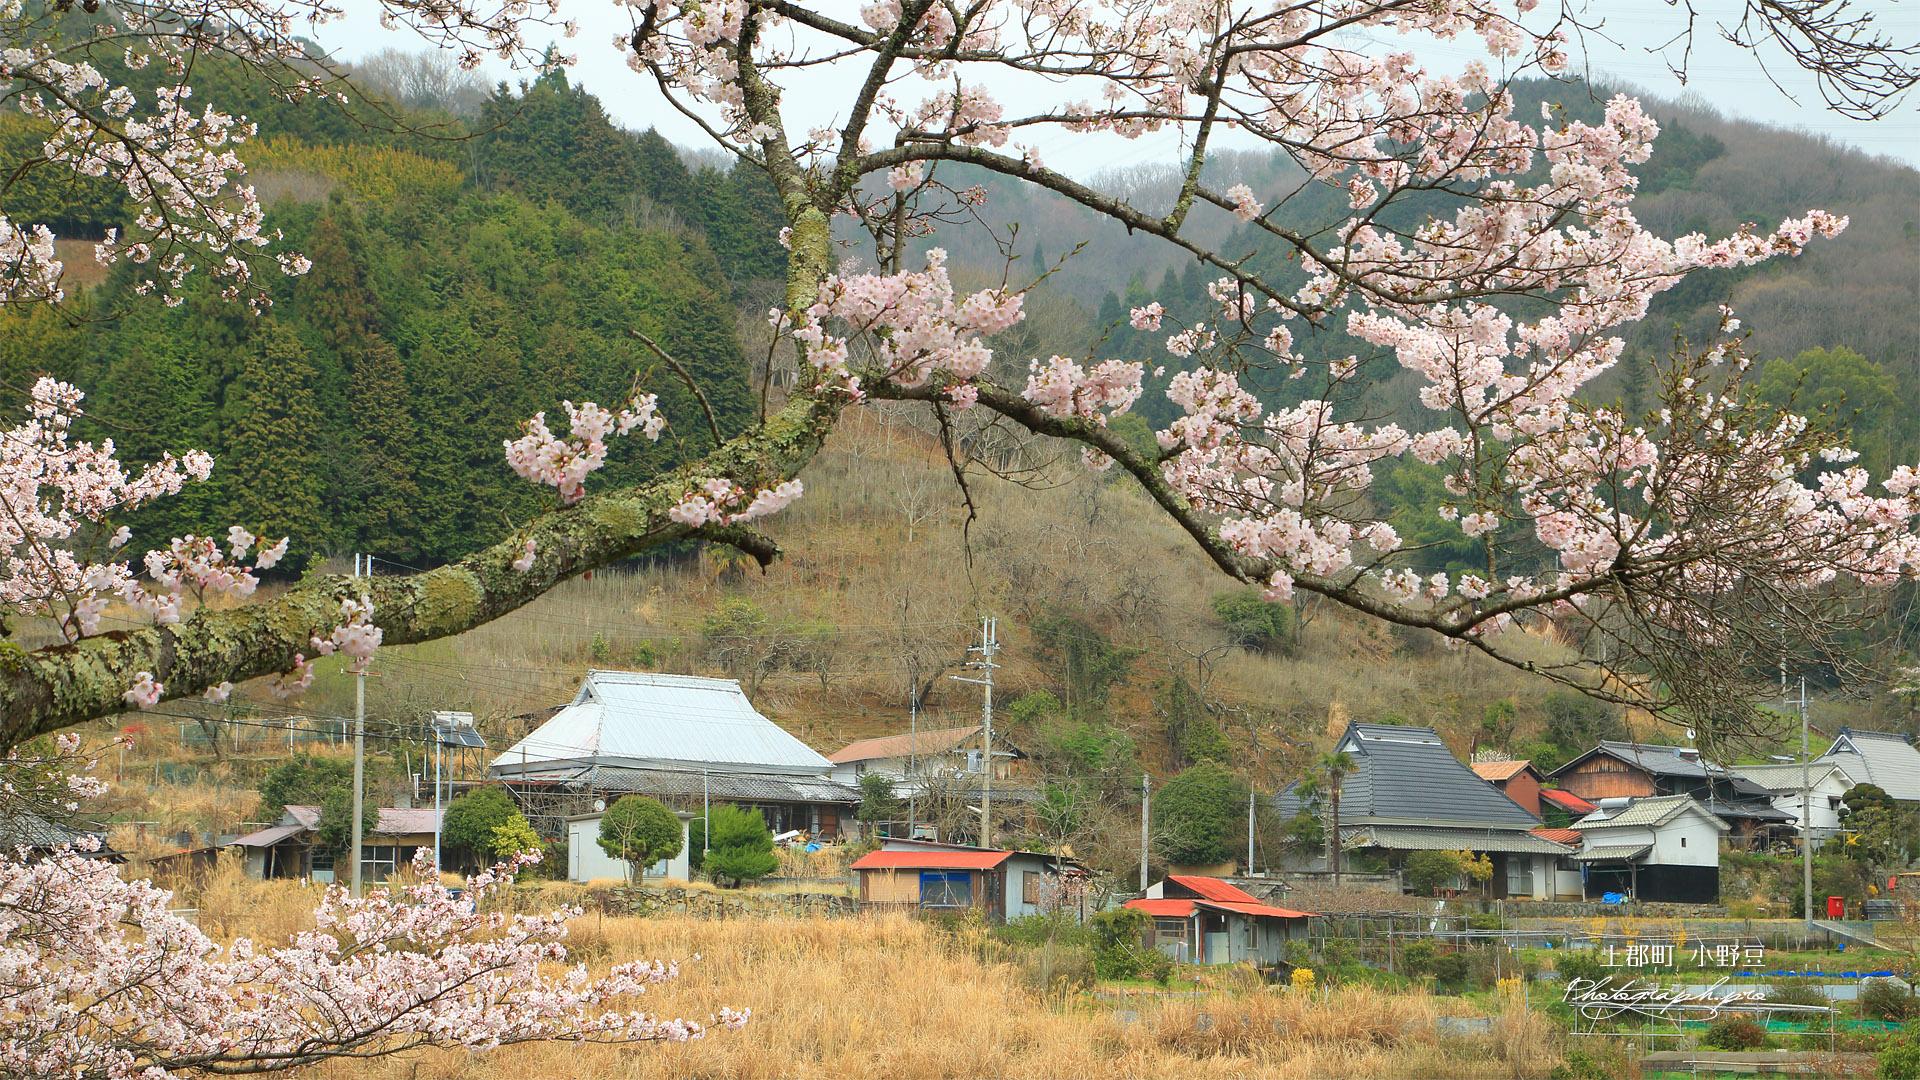 上郡町 小野豆の桜